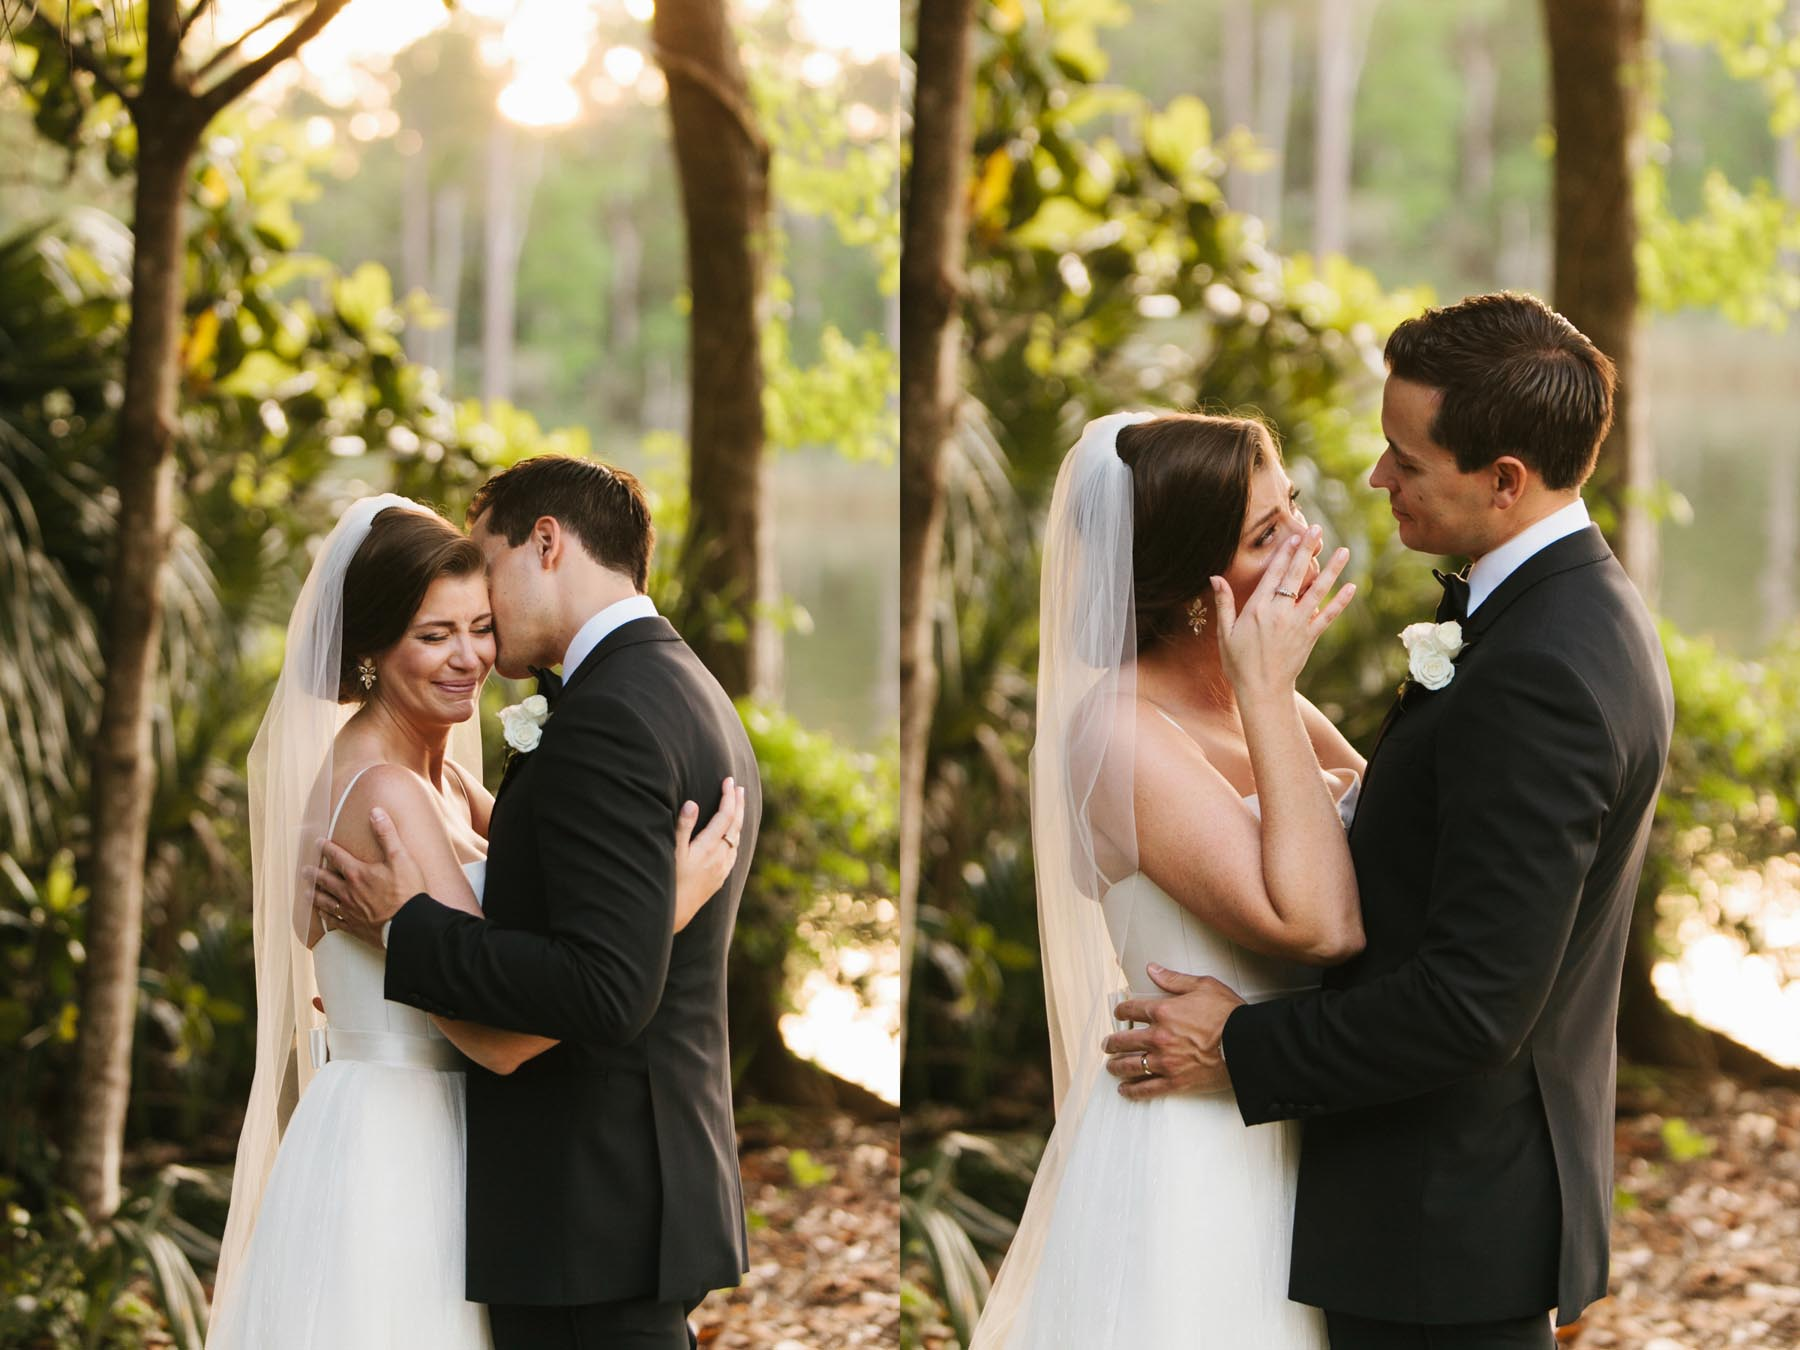 lowry wedding blog eden garden florida wedding-101